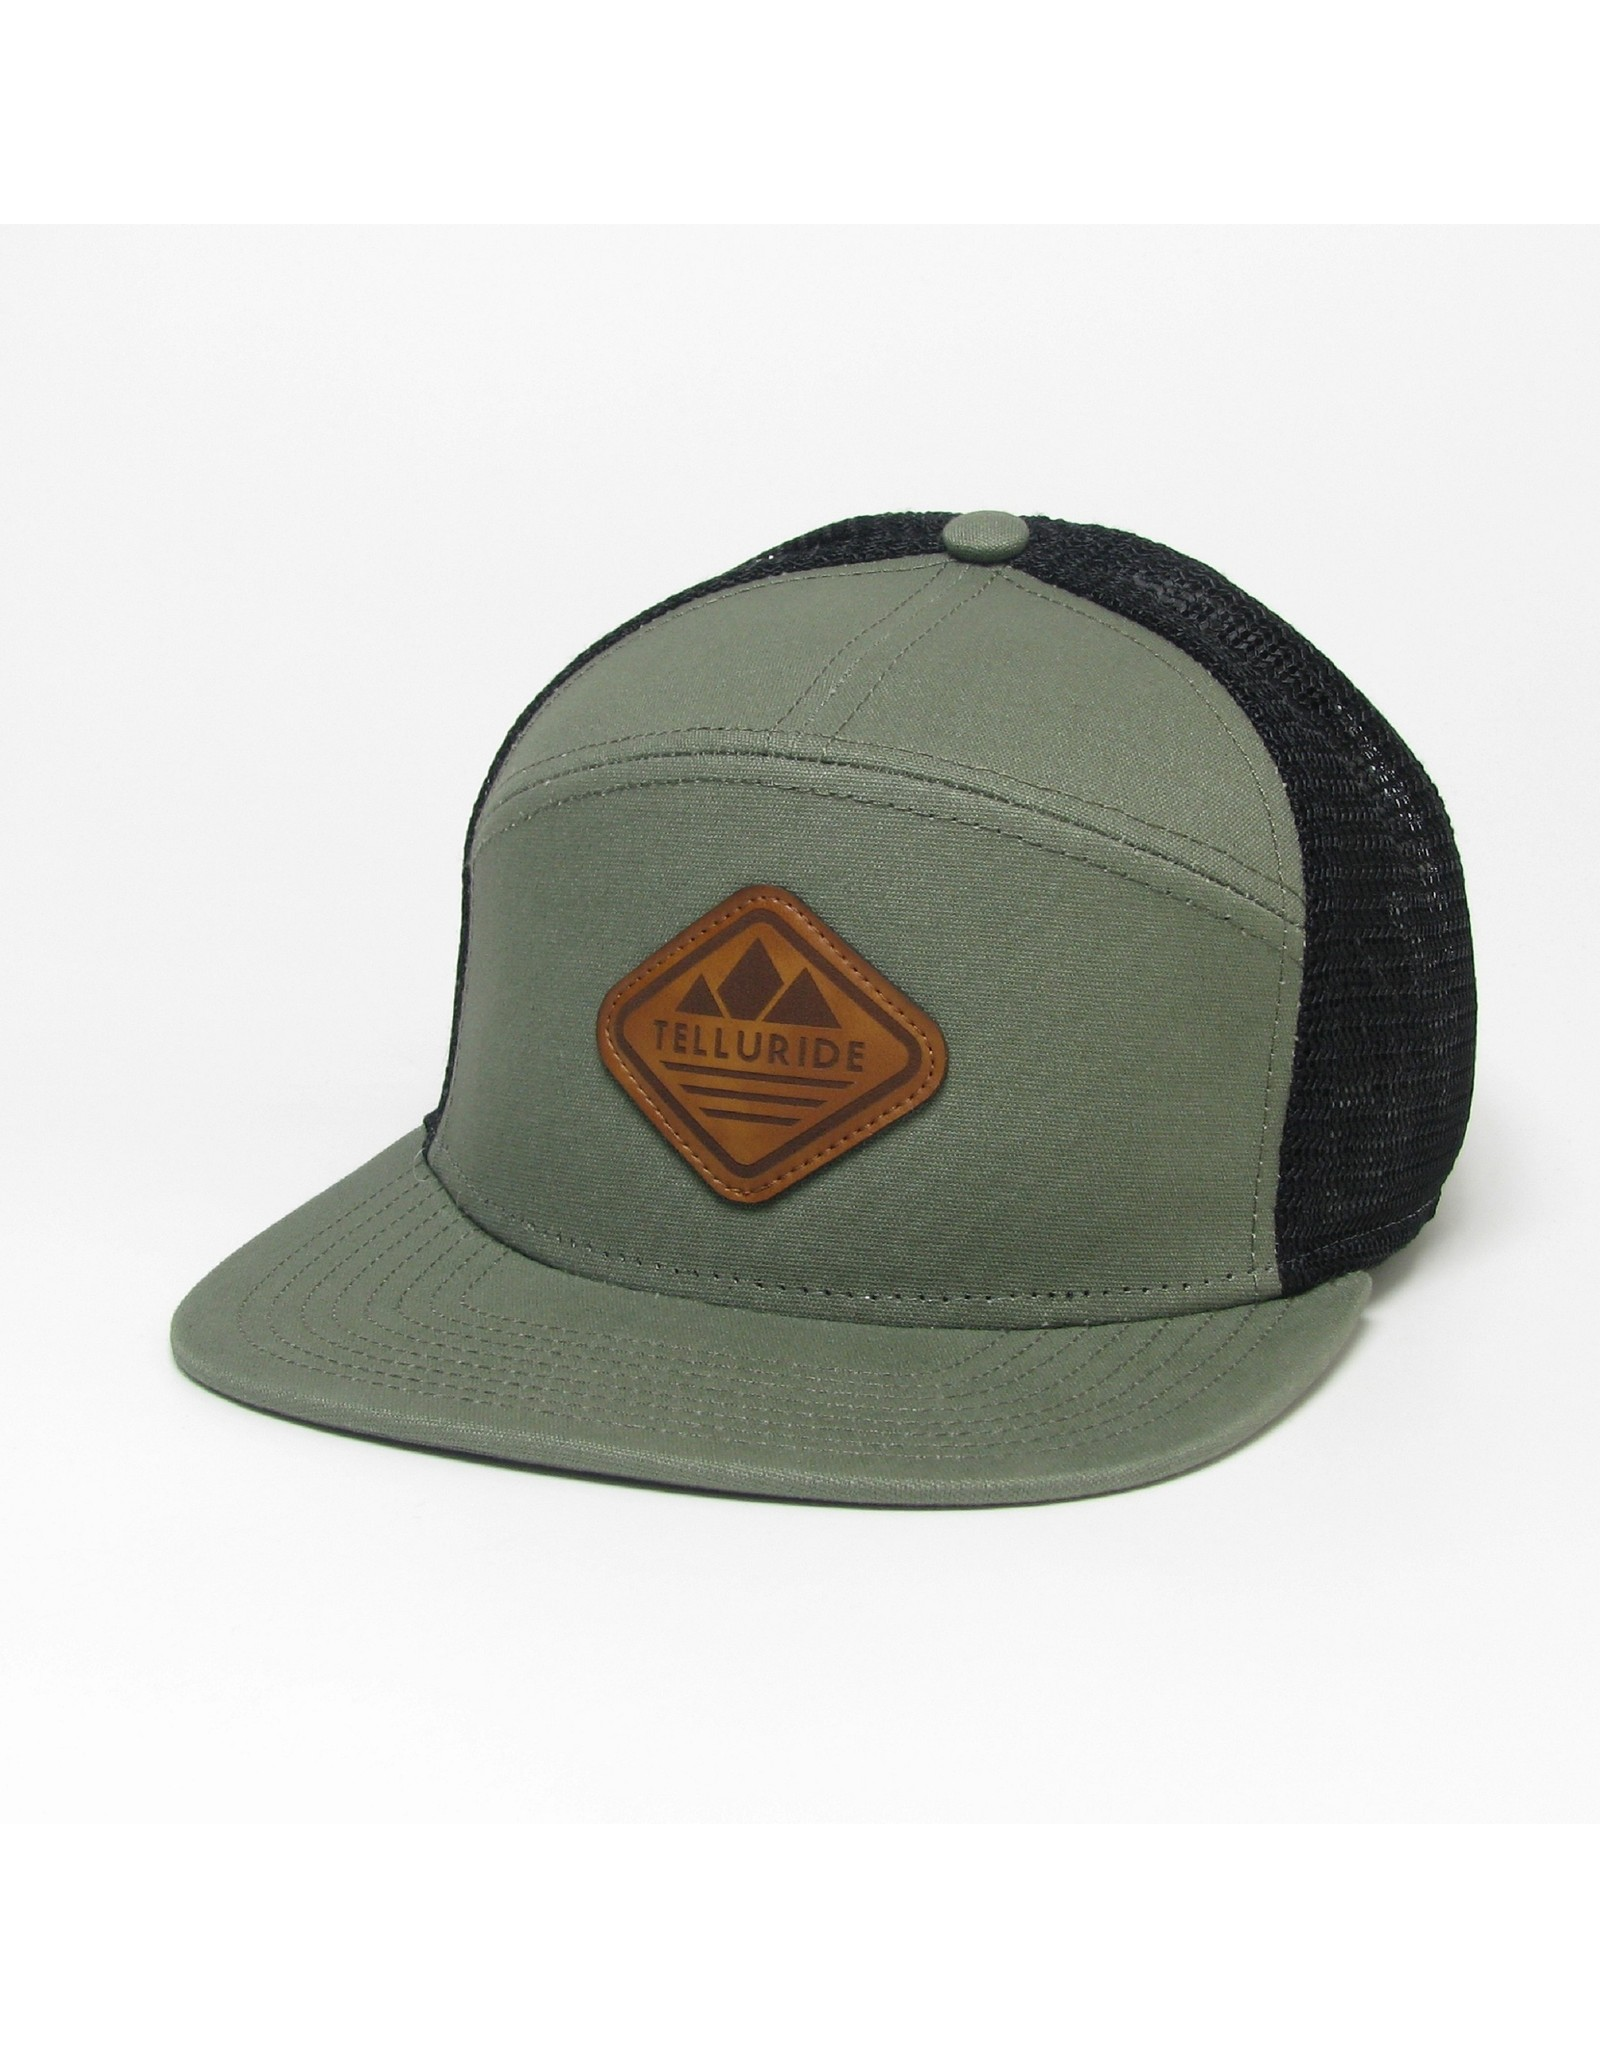 LEGACY LEATHER DIAMOND HAT OLIVE 1200012